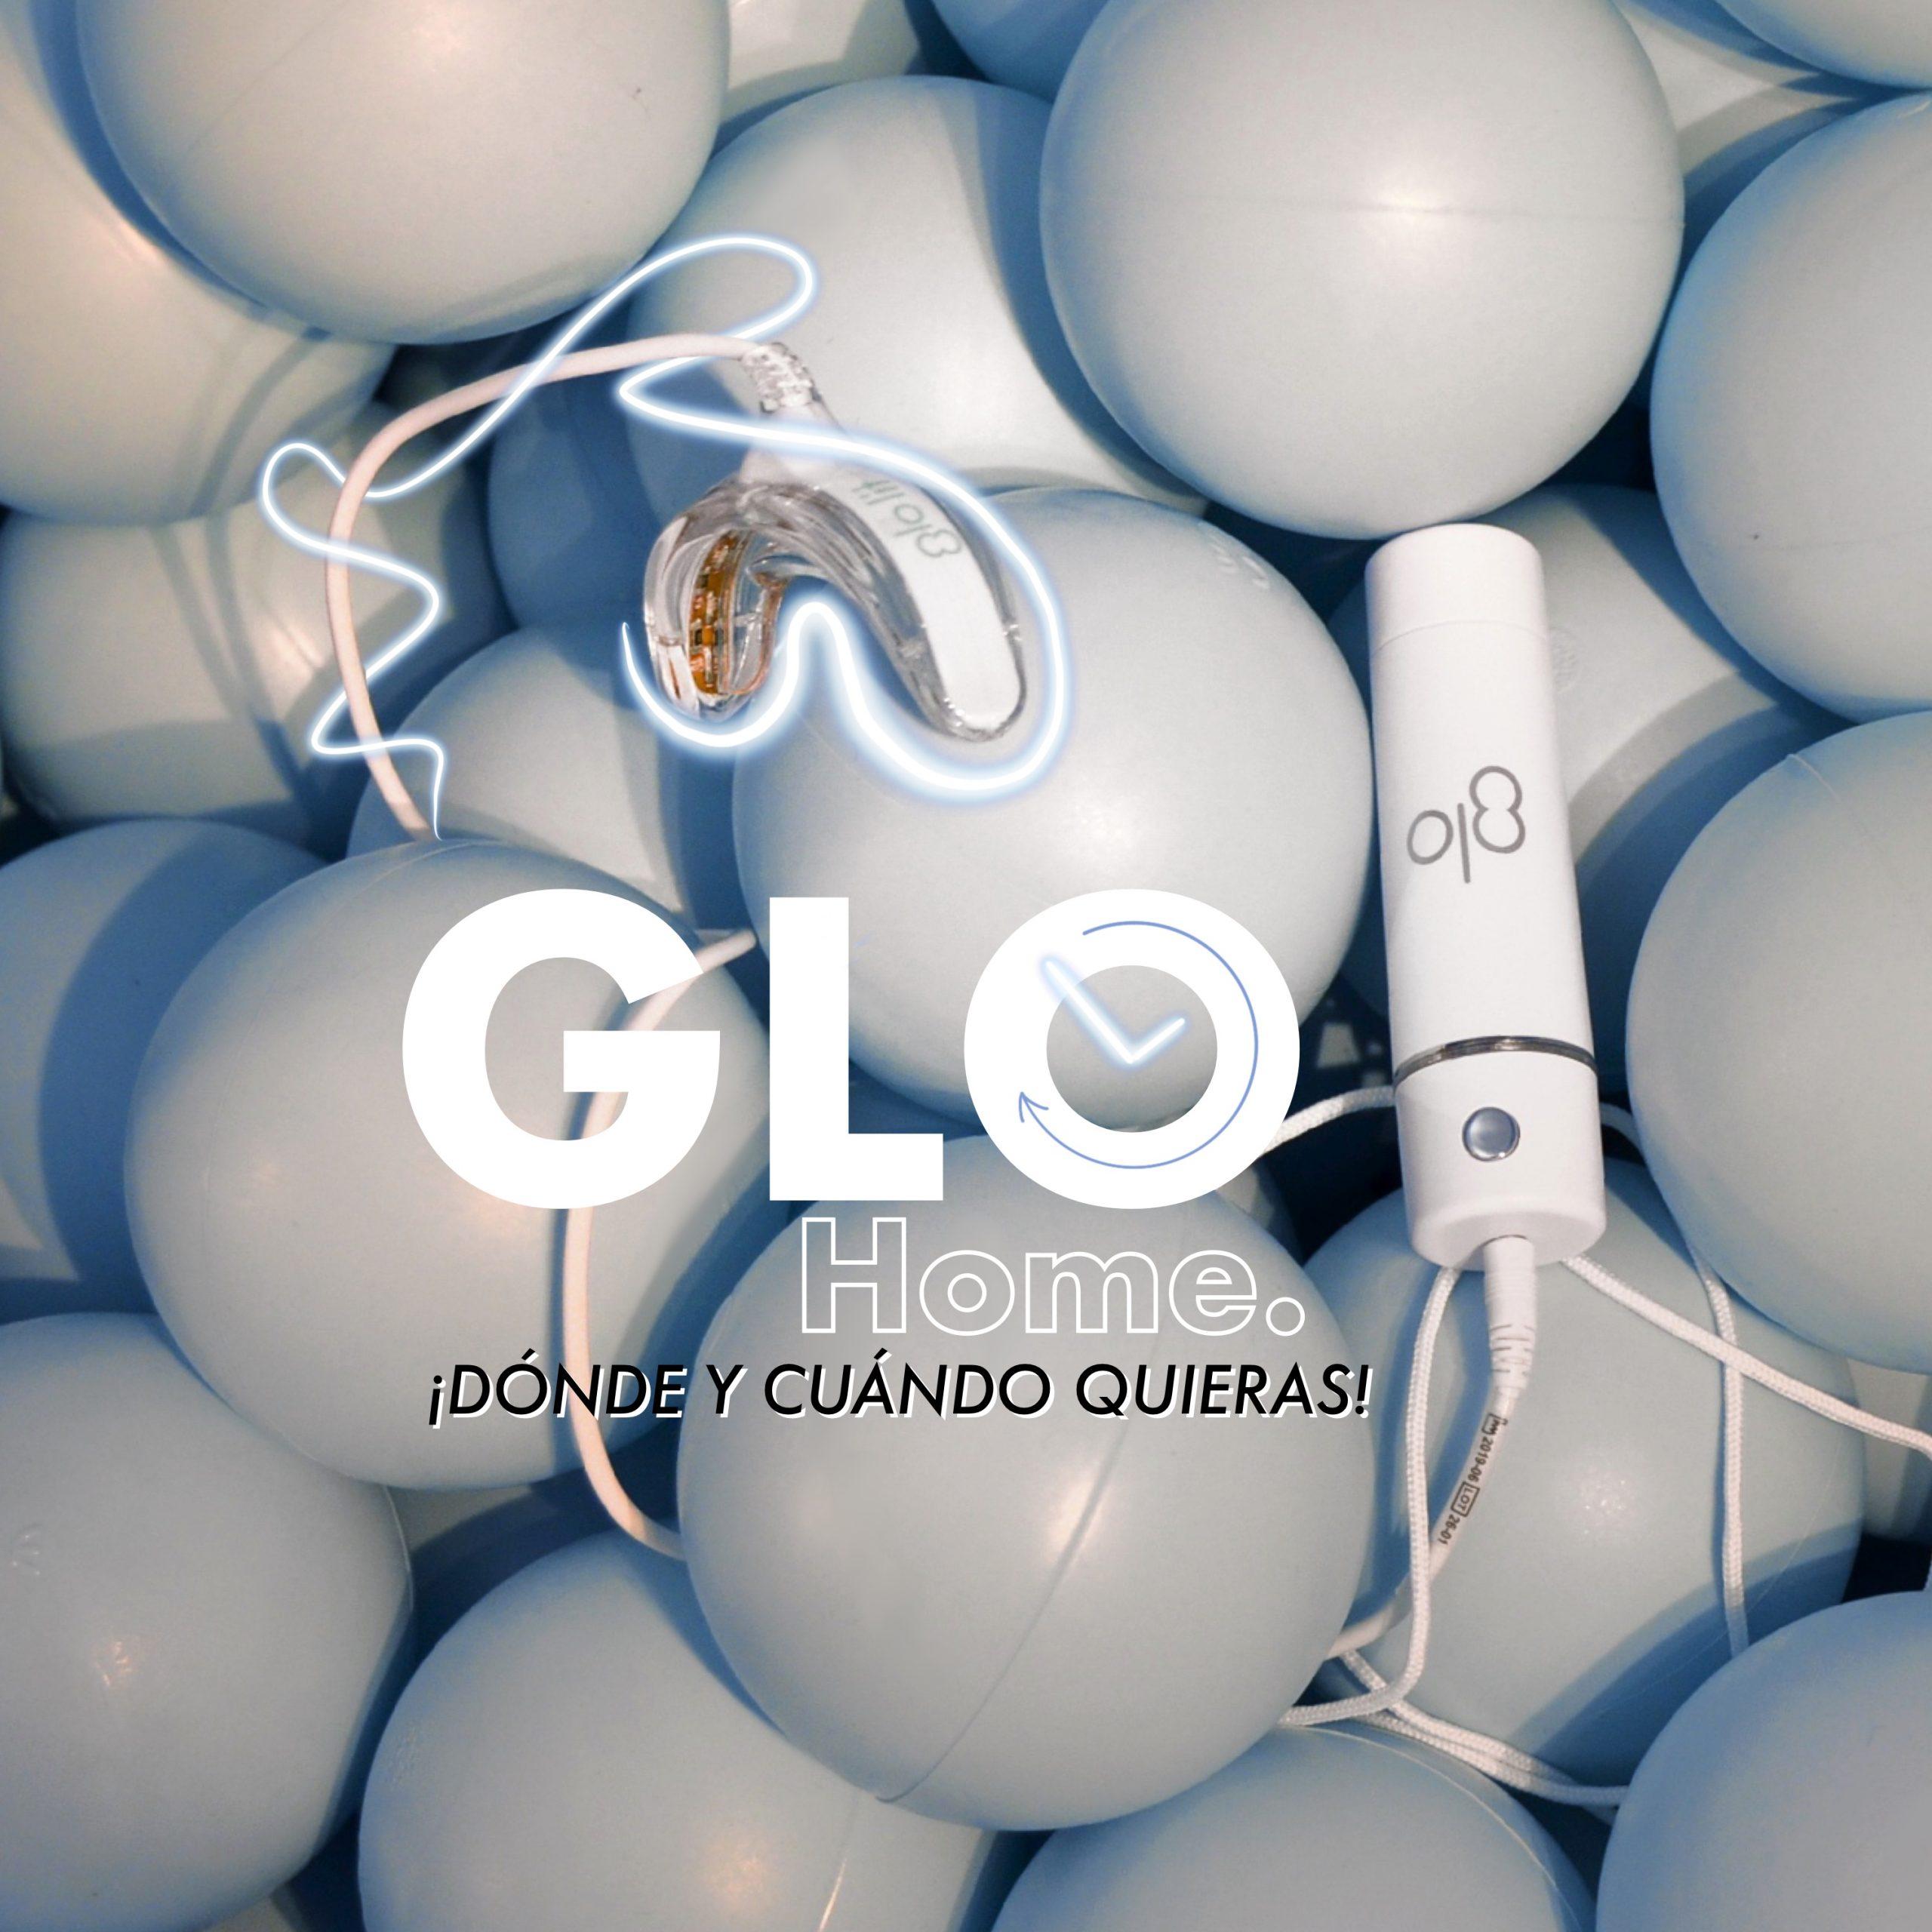 glo-home